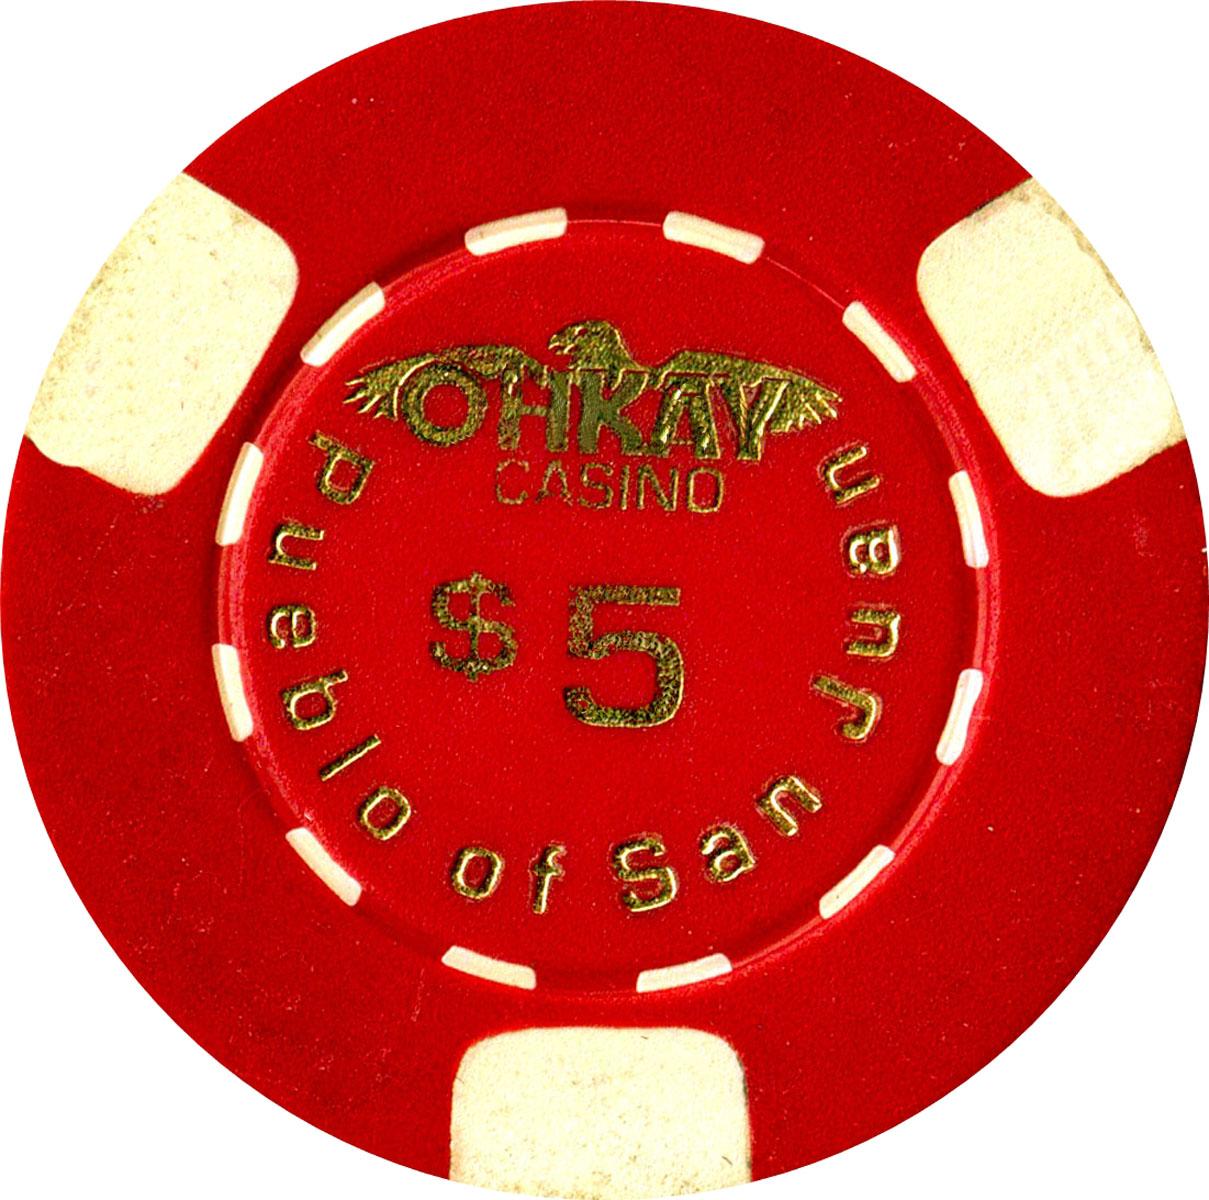 777 las vegas casino